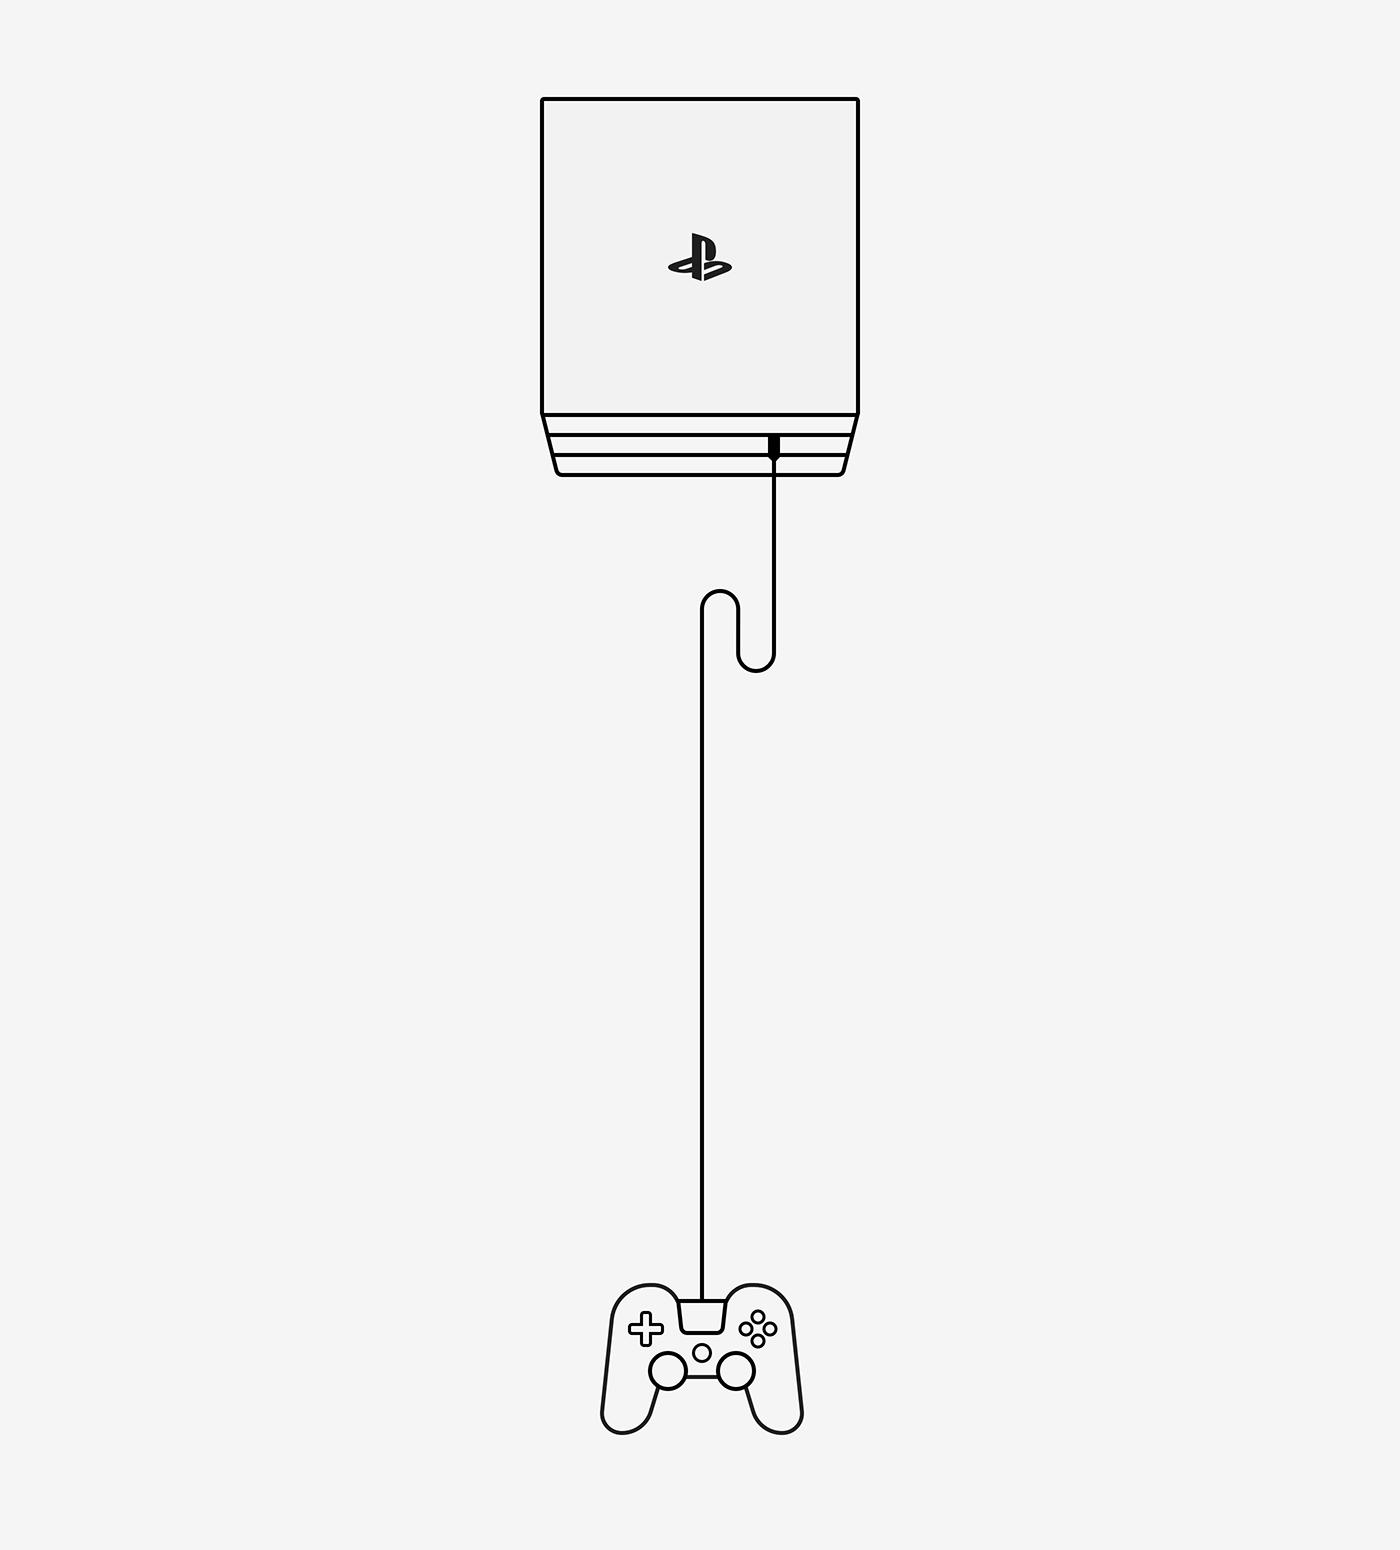 Playstation极简风格APP概念设计